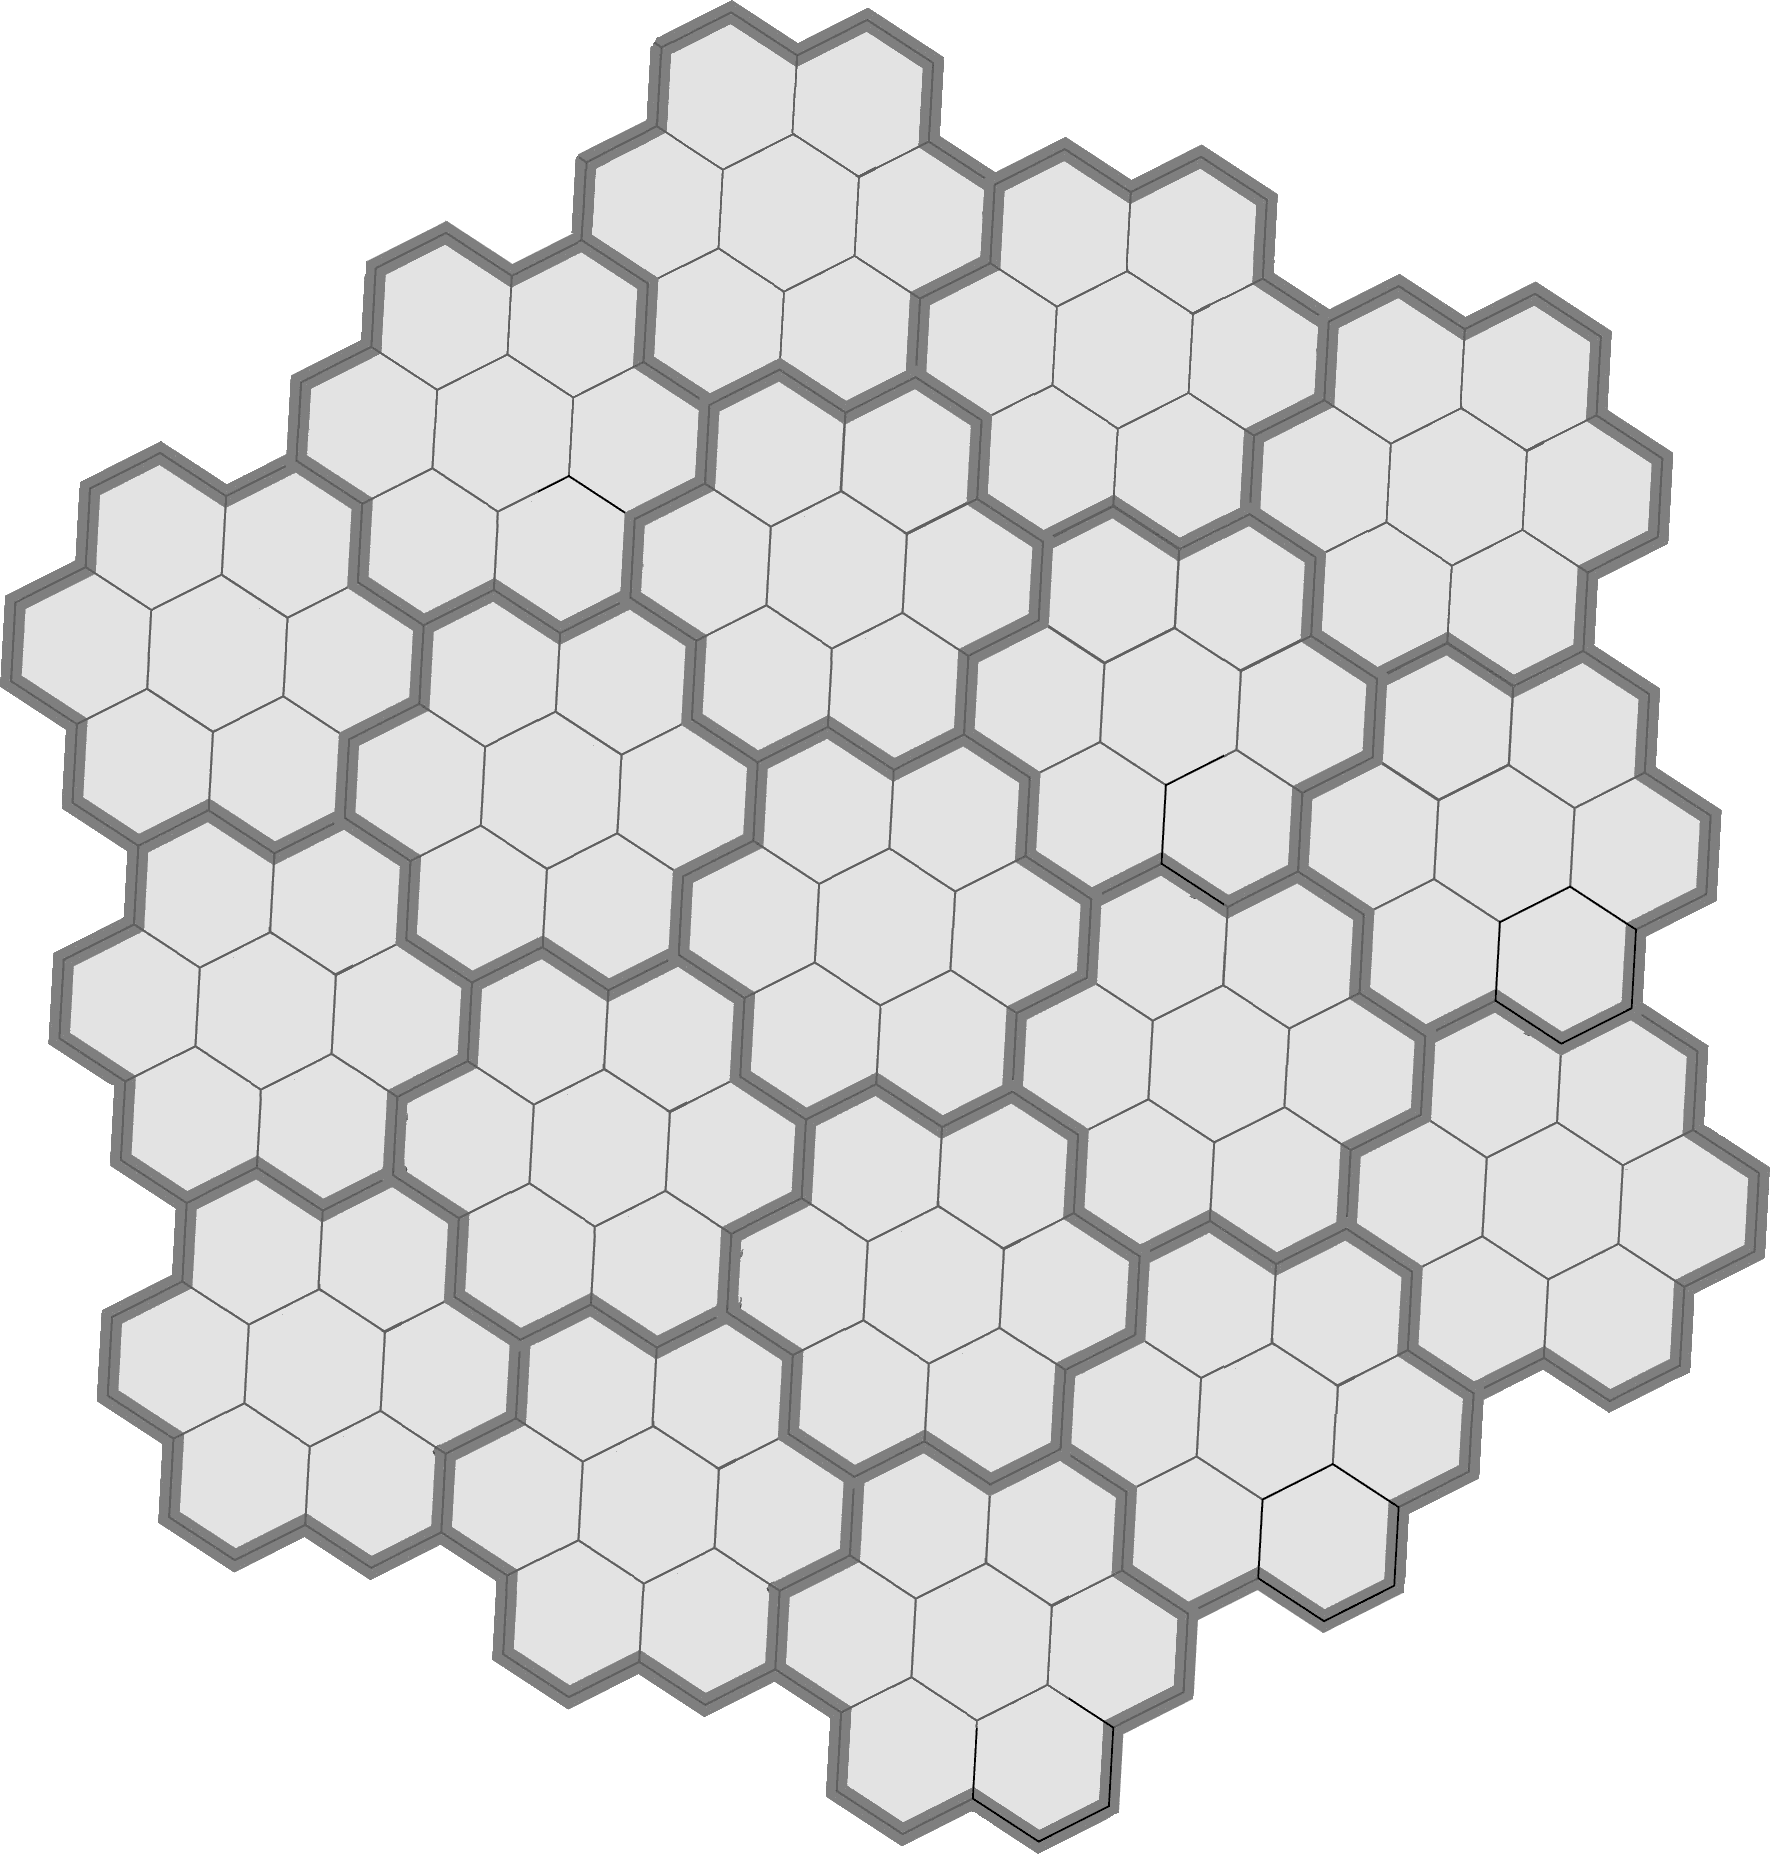 Hexagon Game Board | Games World